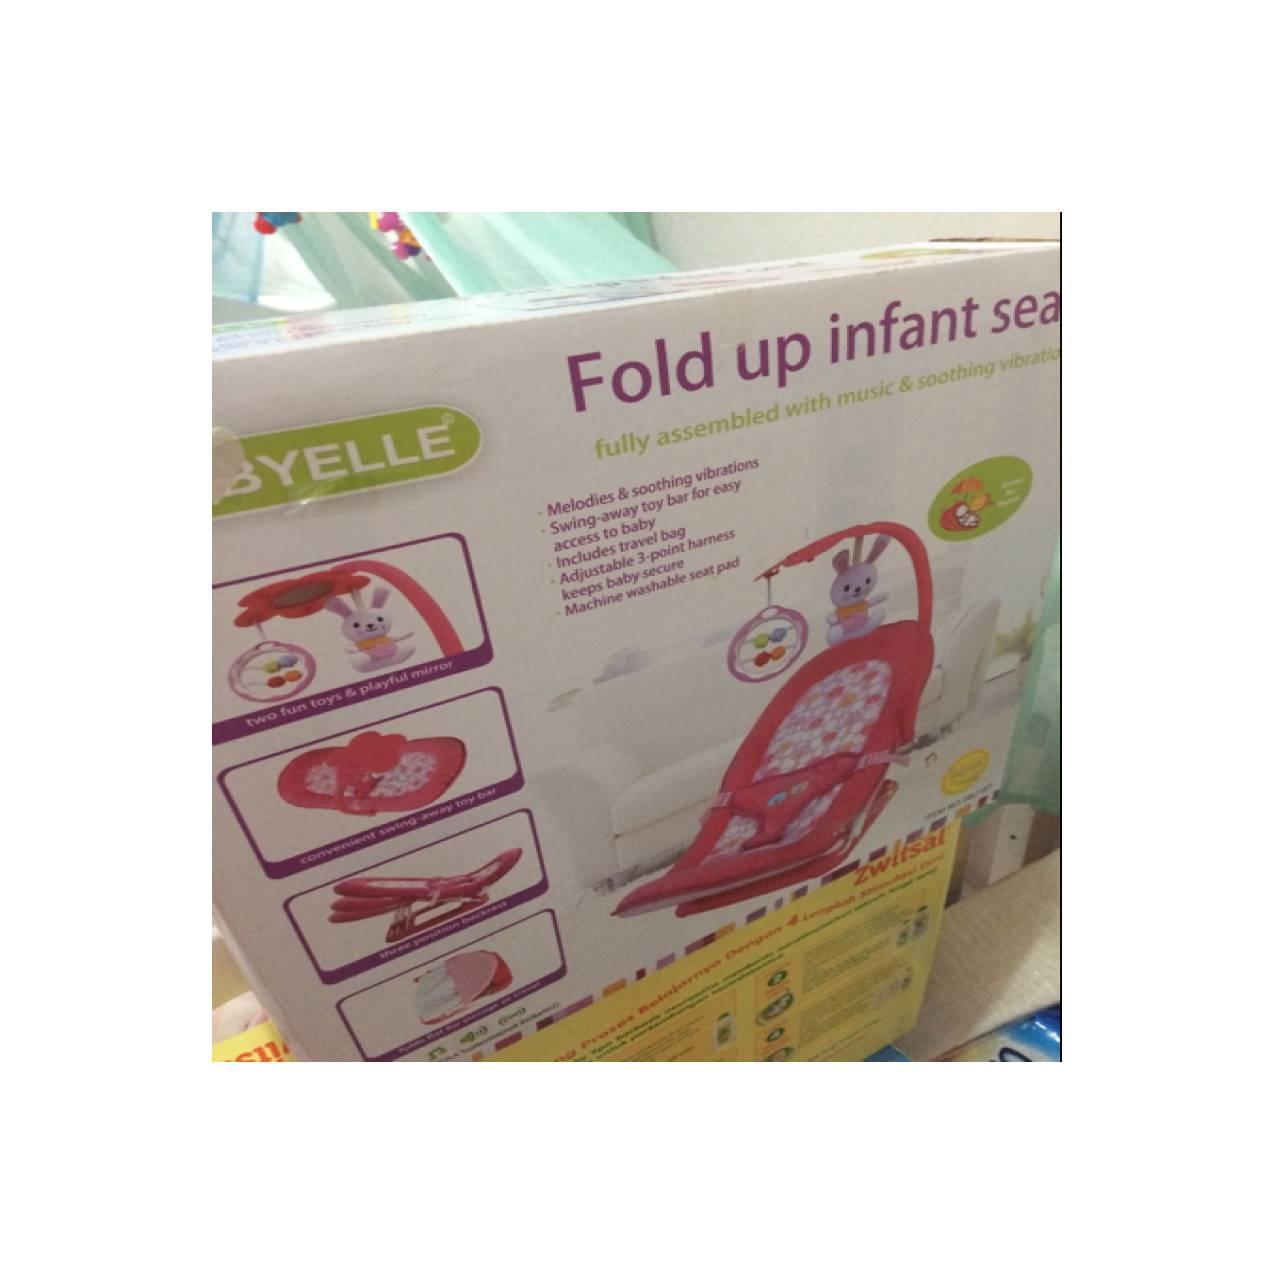 ... Melodies And Soothing Vibrations - Baby Elle Kursi Lipat Bayi - Merah Muda. IDR 249,500 IDR249500. View Detail. fold up infant seat babyelle